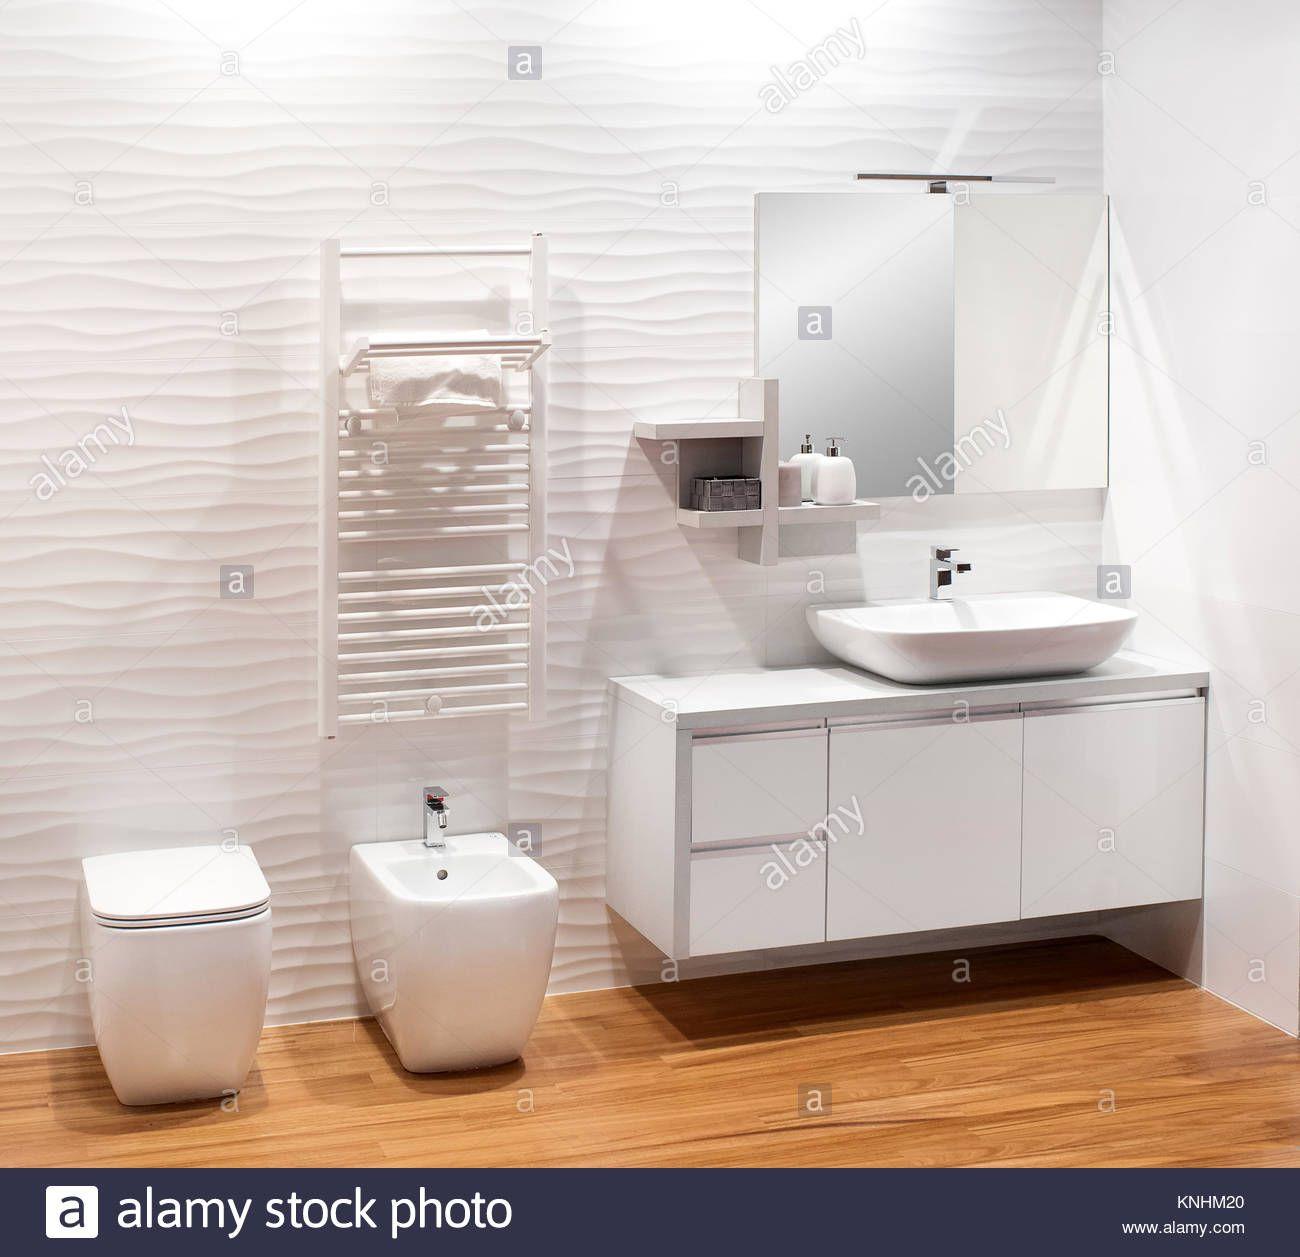 Download This Stock Image Plain Monochromatic White Bathroom With Simple Vanity Cabinet Bidet And Toilet O Small Bathroom Tiles Small Bathroom White Bathroom